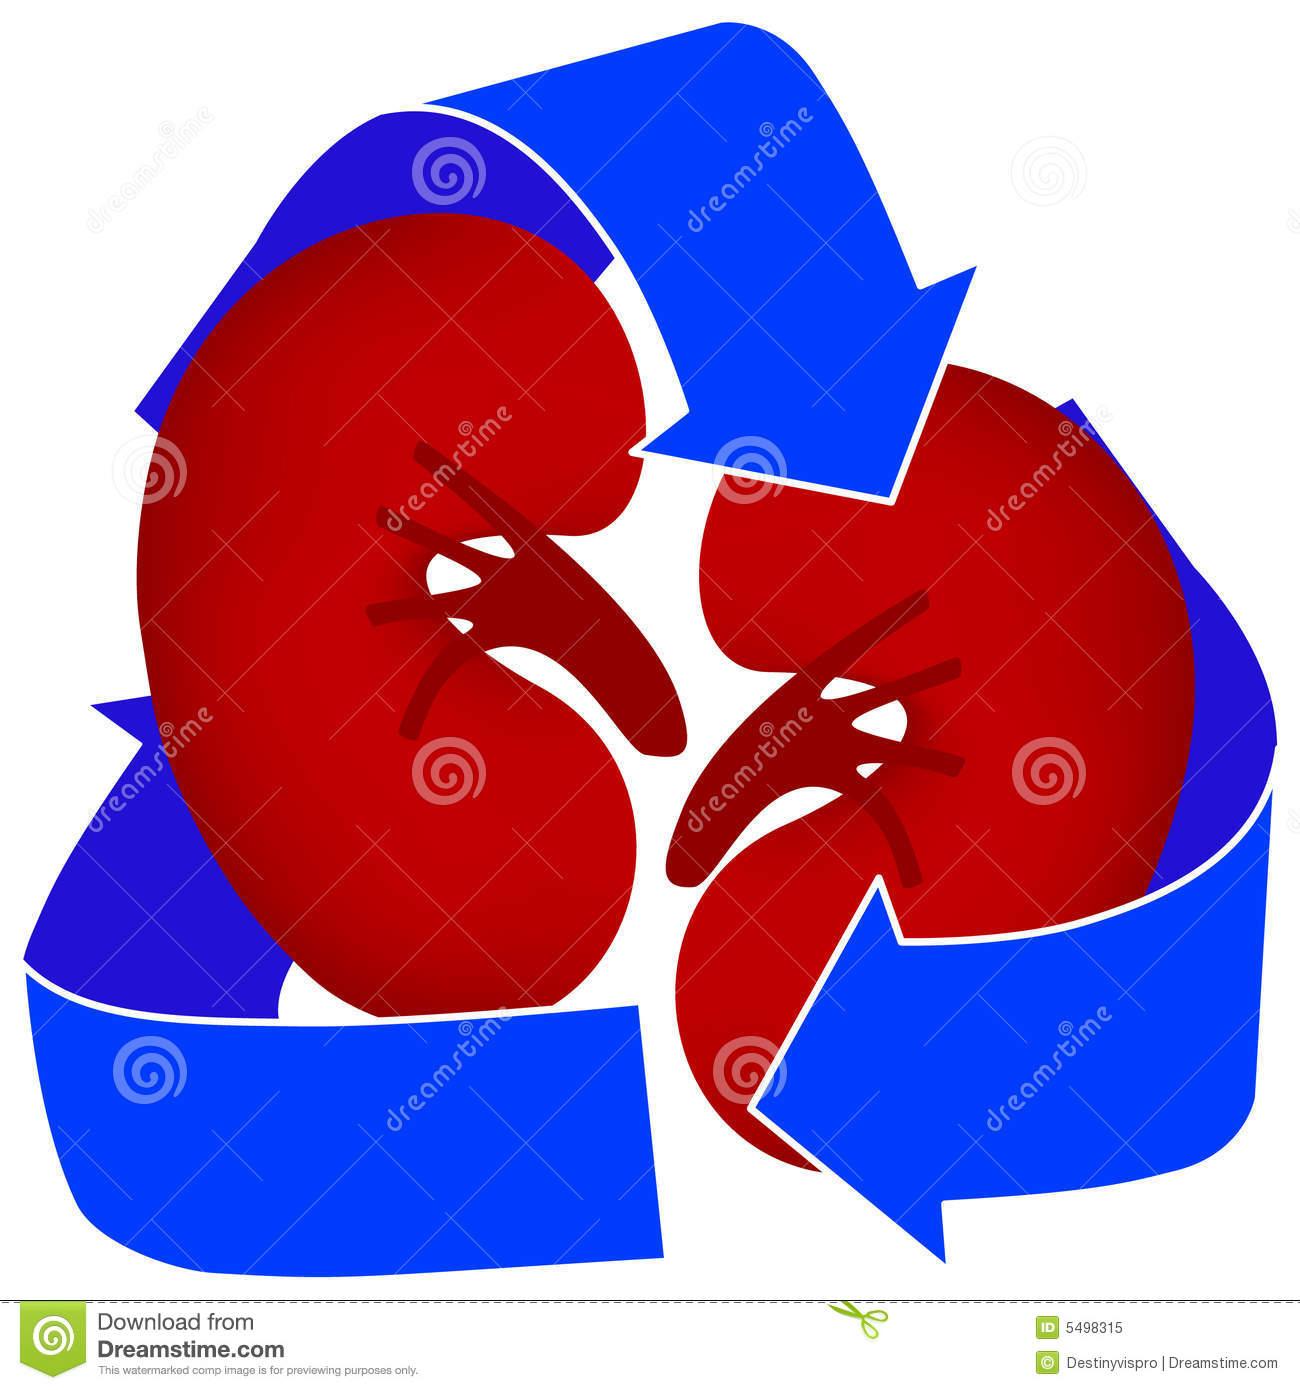 Organ donor clipart.